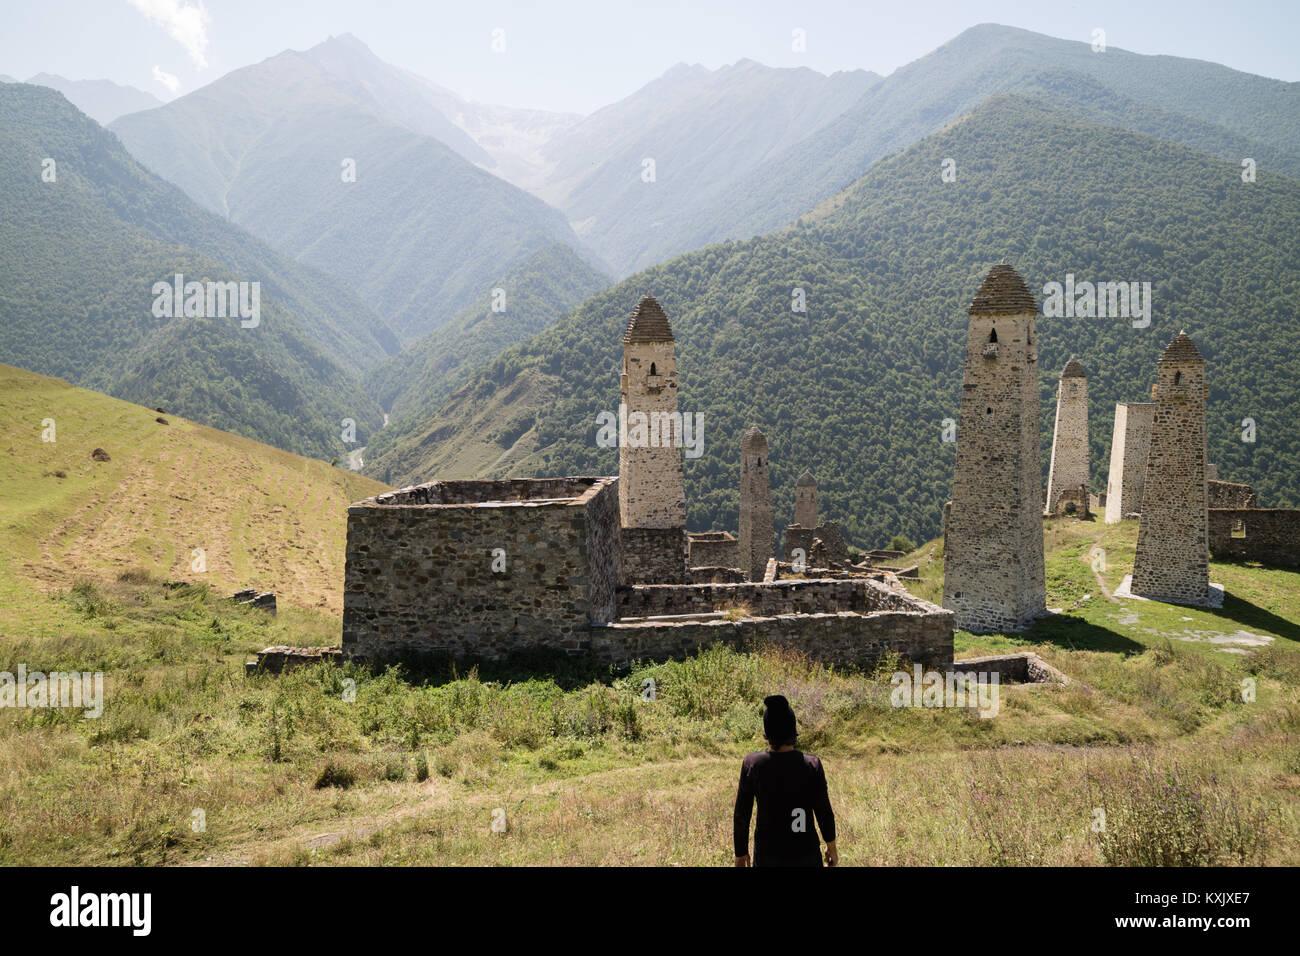 Erzi military medieval towers, Mountains of Ingushetia/Chechnya, North Caucasus - Stock Image